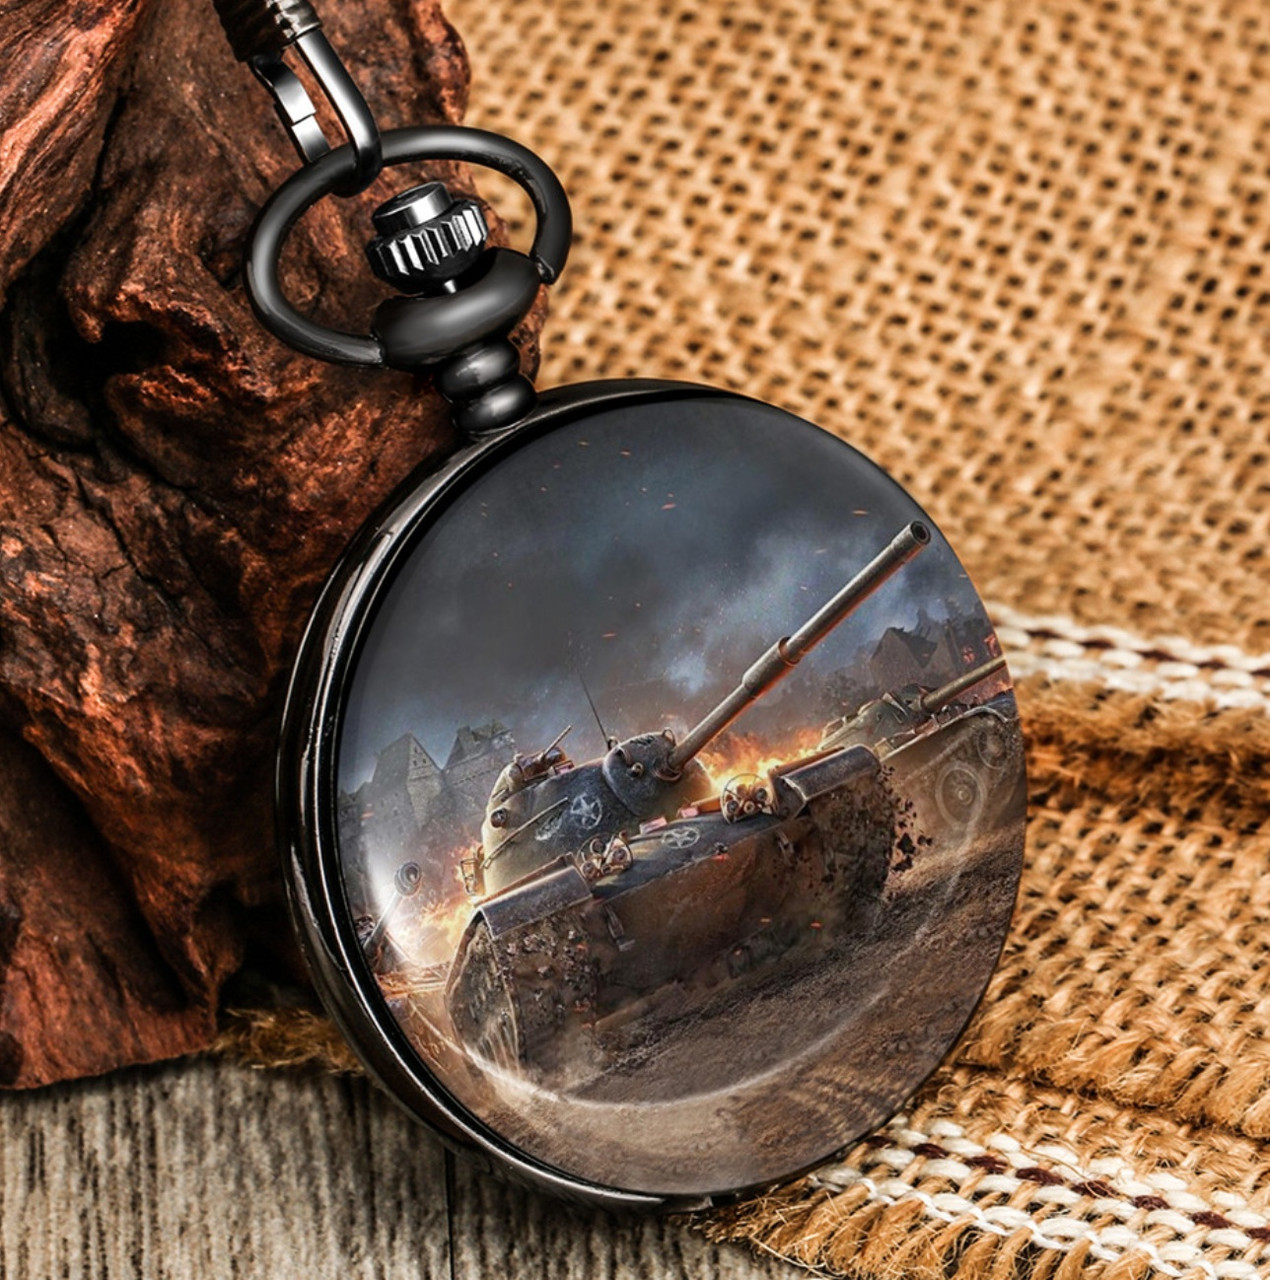 Карманные мужские часы на цепочке танк